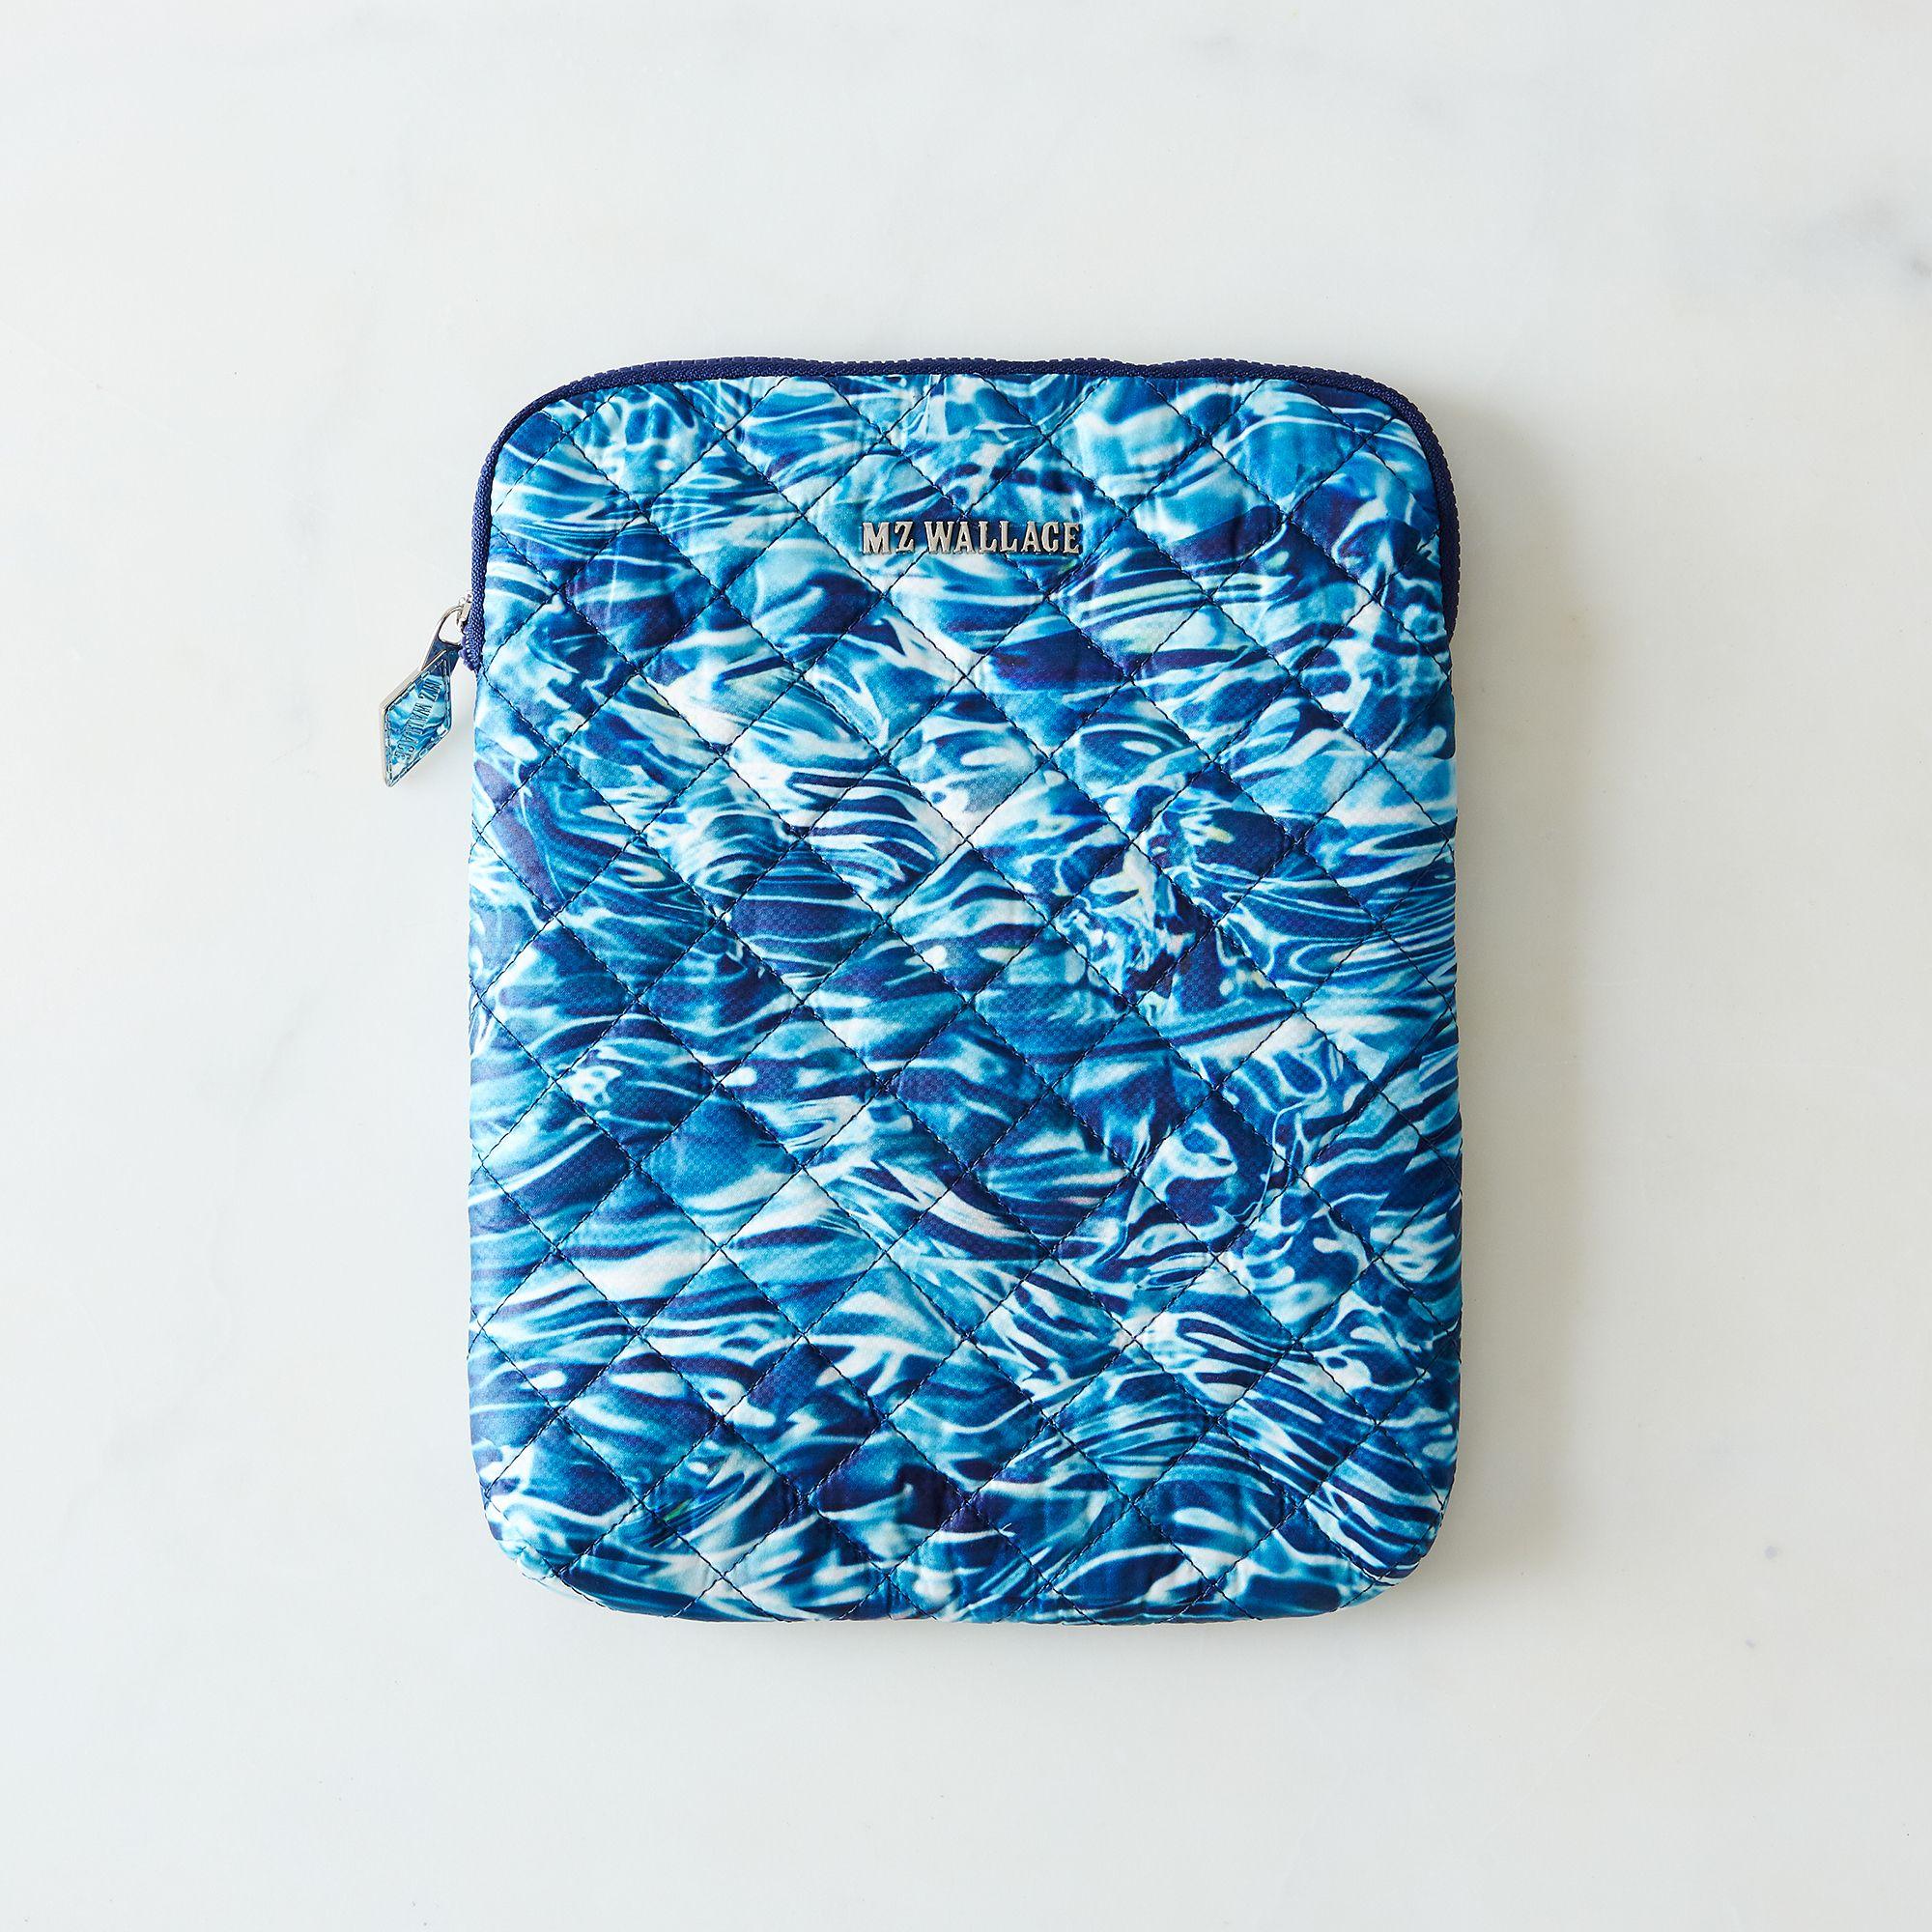 2323a12e a0f8 11e5 a190 0ef7535729df  2015 0402 mz wallace food52 water print bags ipad case silo mark weinberg 0075